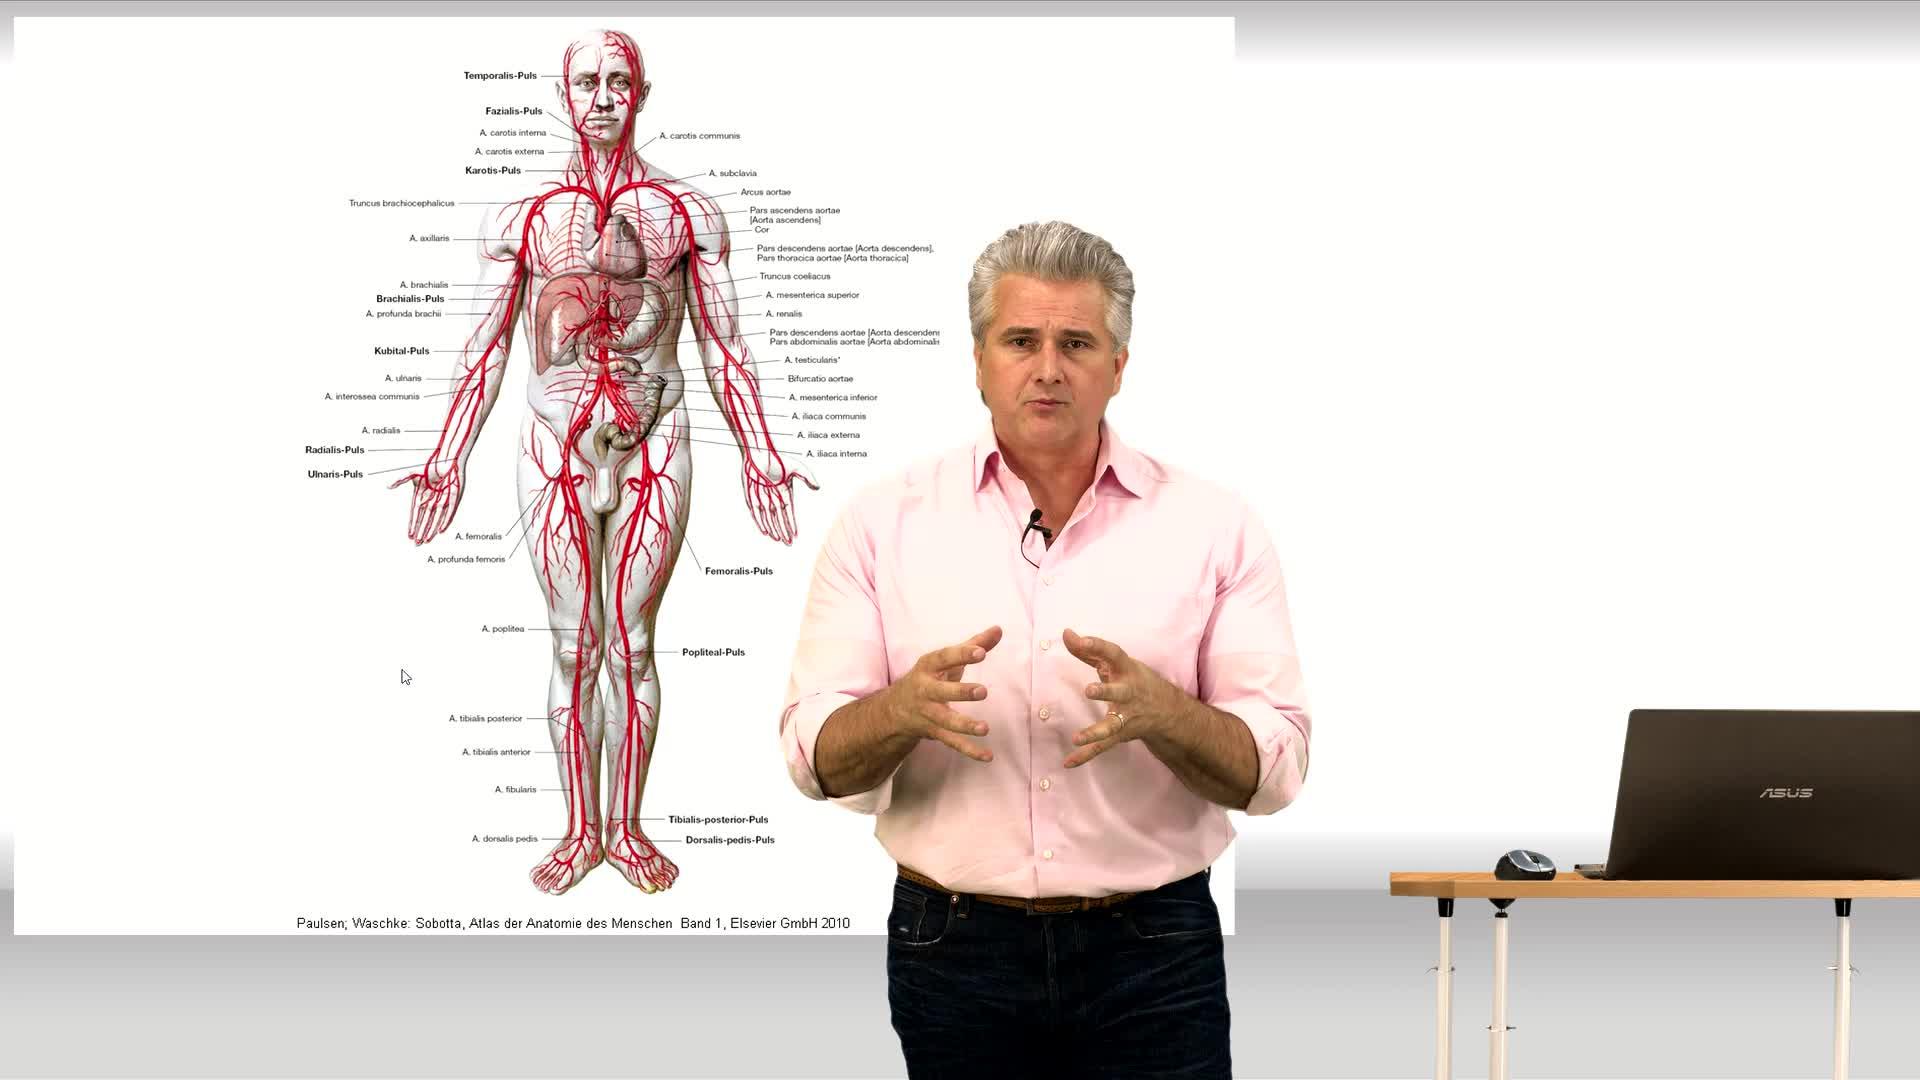 Die großen Arterien & Venen des Körpers – Online Medizin Kurs | Lecturio